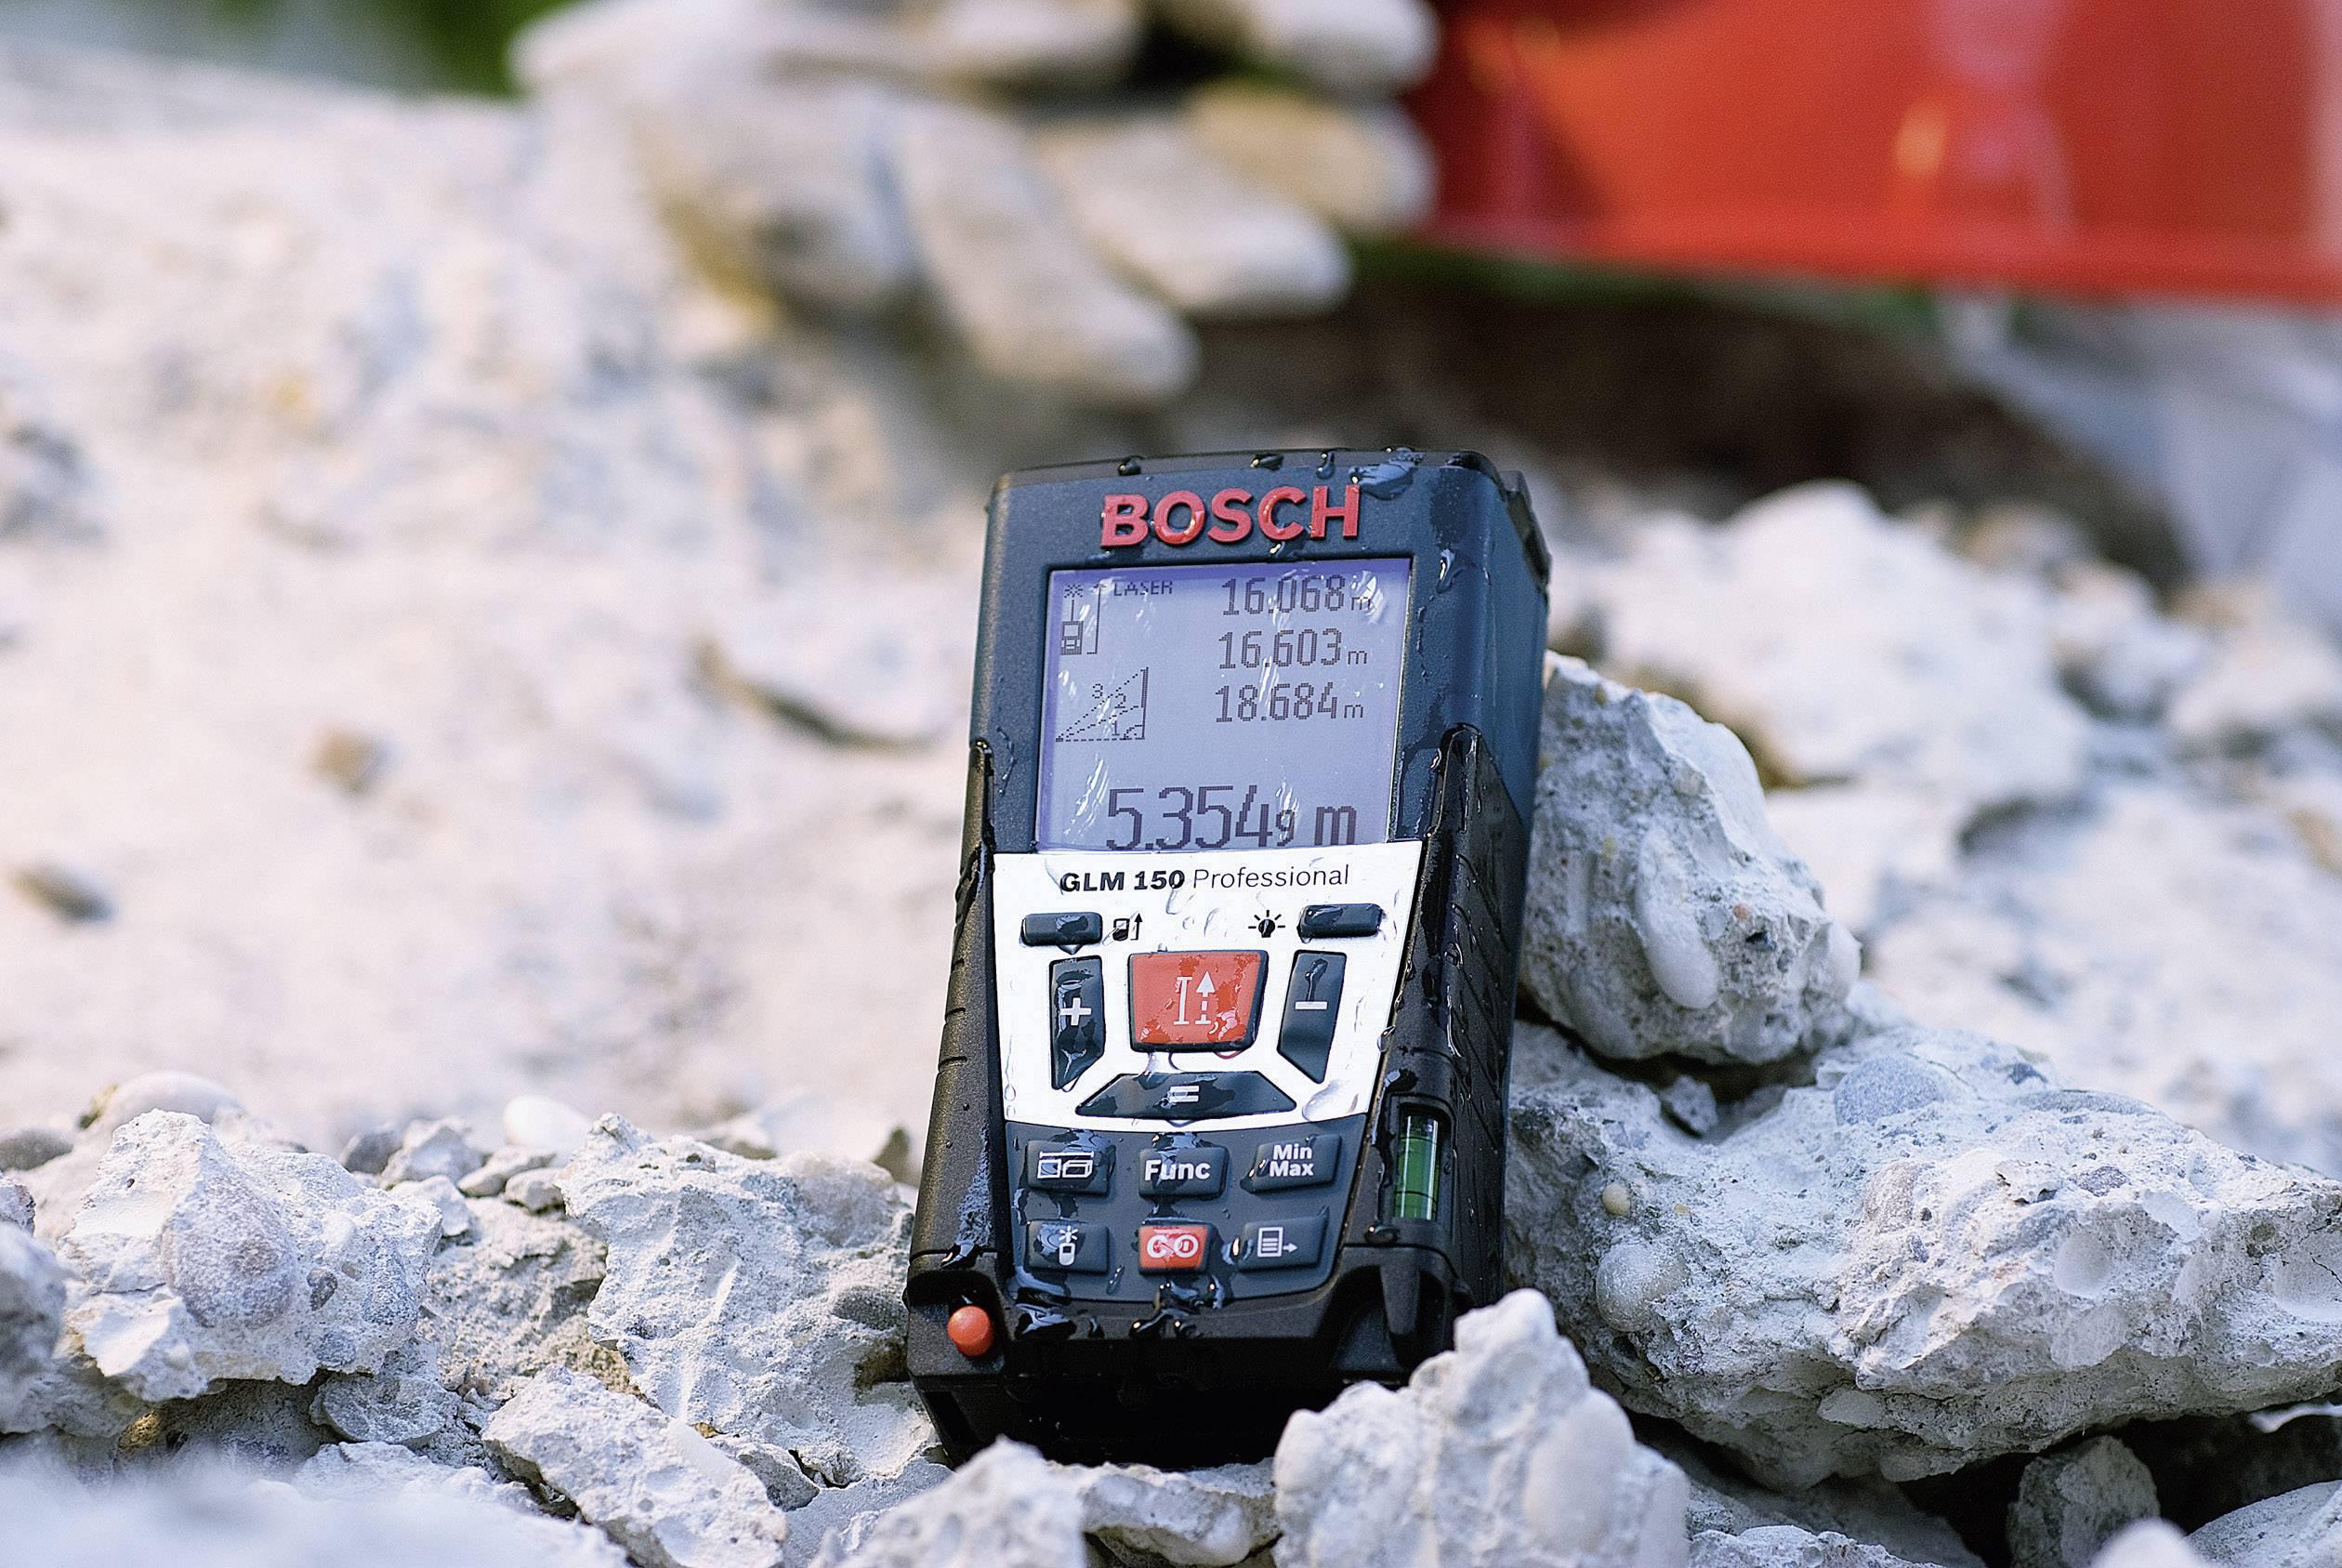 Bosch Entfernungsmesser Glm : Bosch professional glm laser entfernungsmesser stativadapter